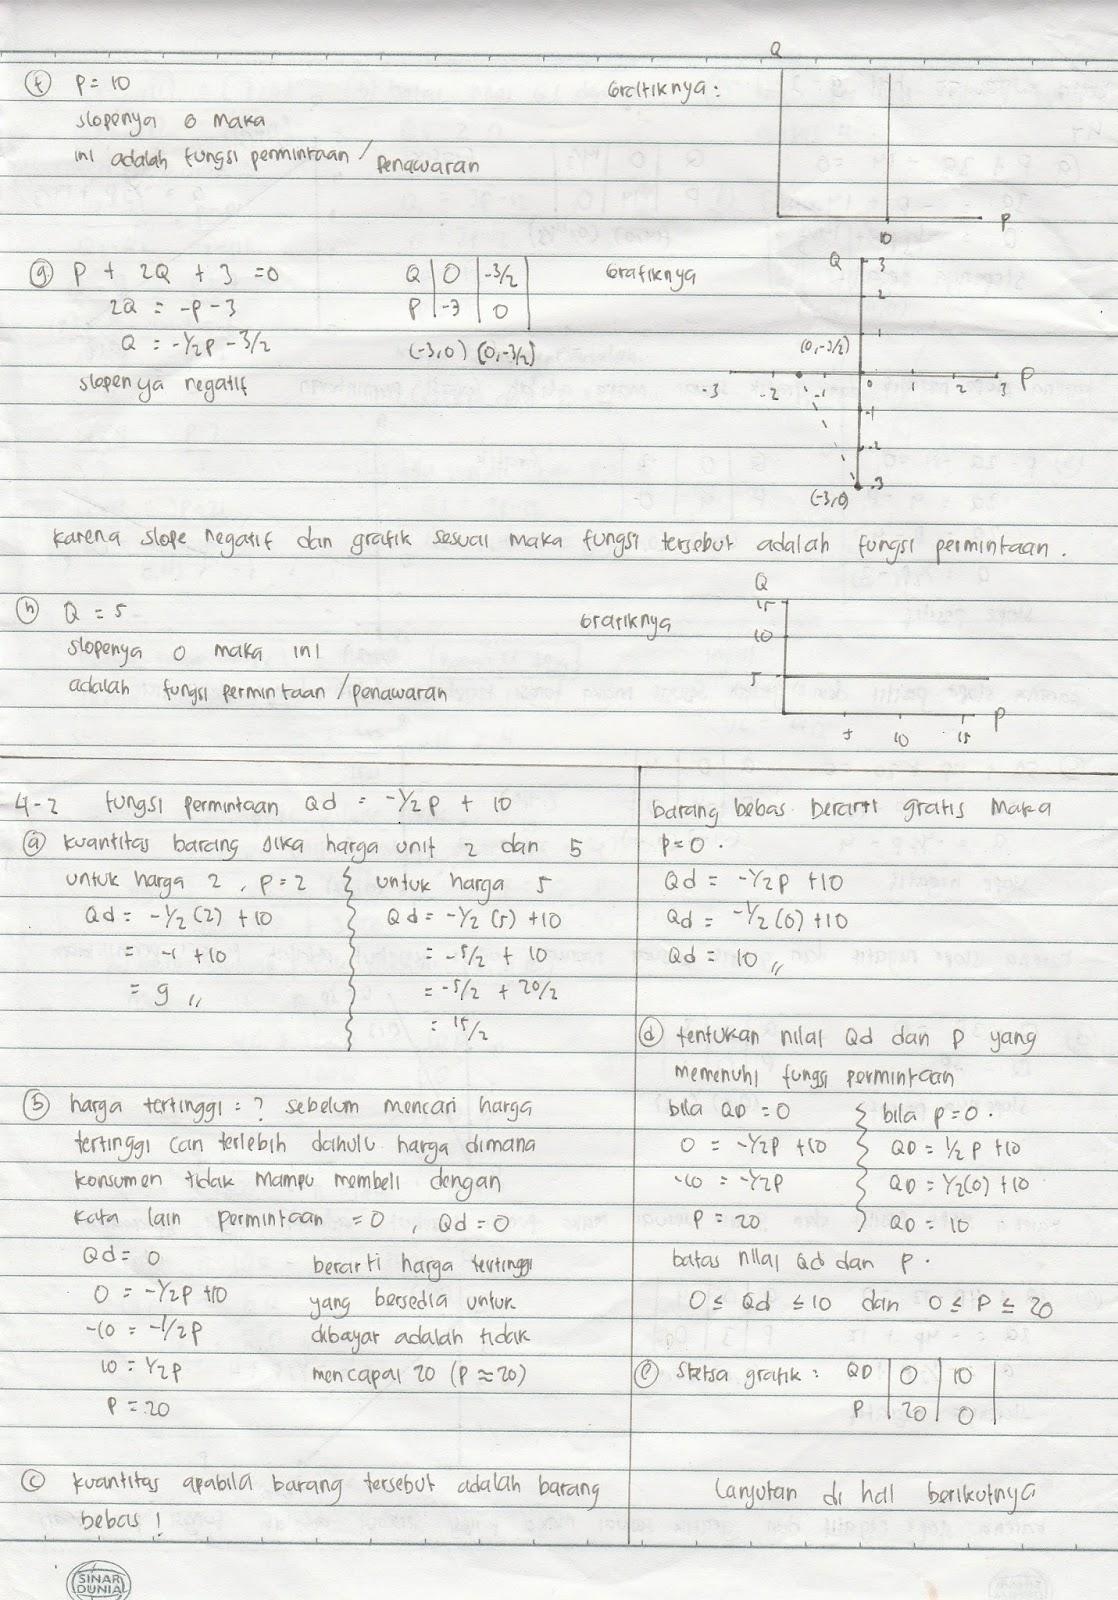 06/01/2021· kunci jawaban buku statistika nata wirawan edisi keempat. Latihan Halaman 93 Buku Matematika Ekonomi Oleh Bapak Nata Wirawan Mai Melajah